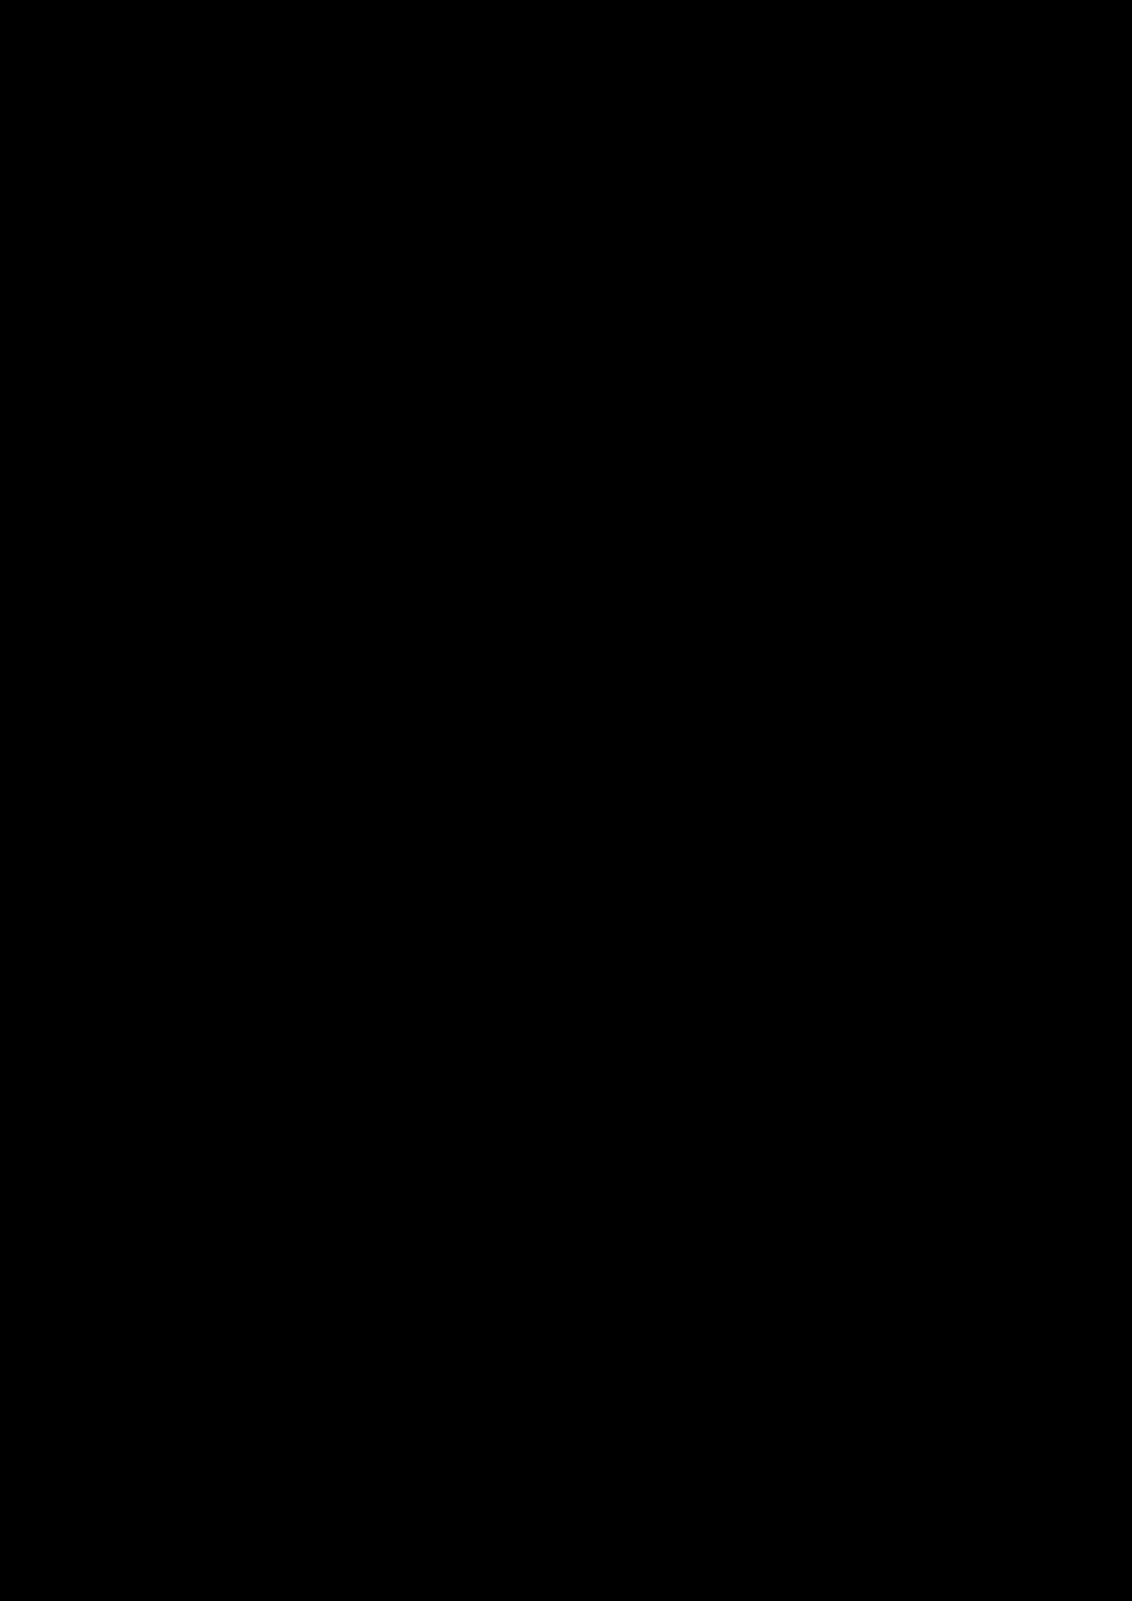 Ten lyubvi slide, Image 15